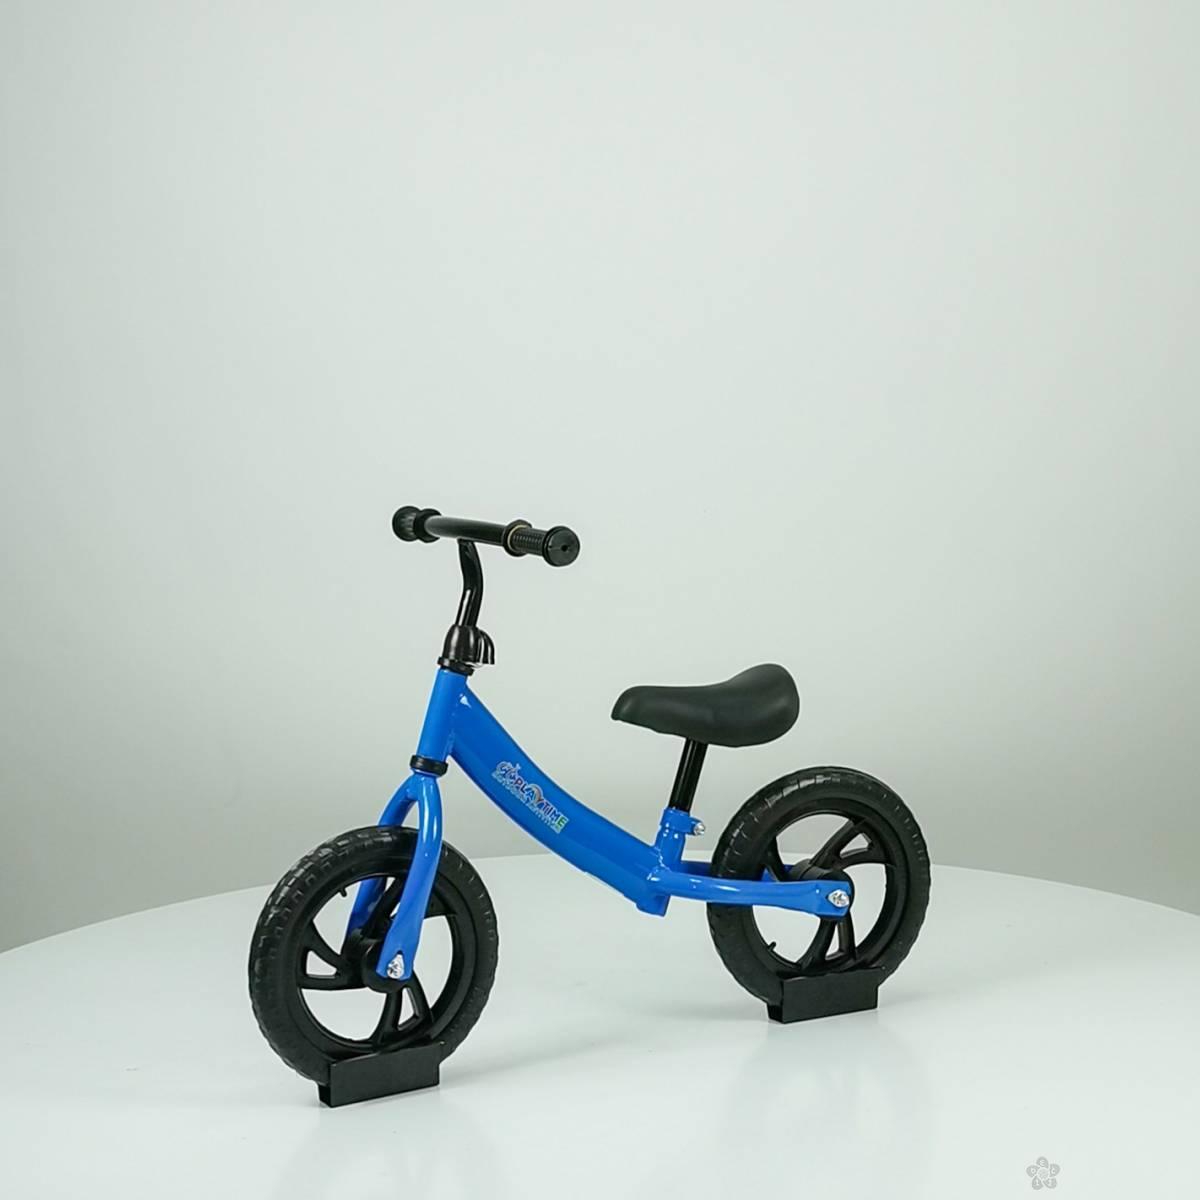 Balans bicikl model 752 plavi